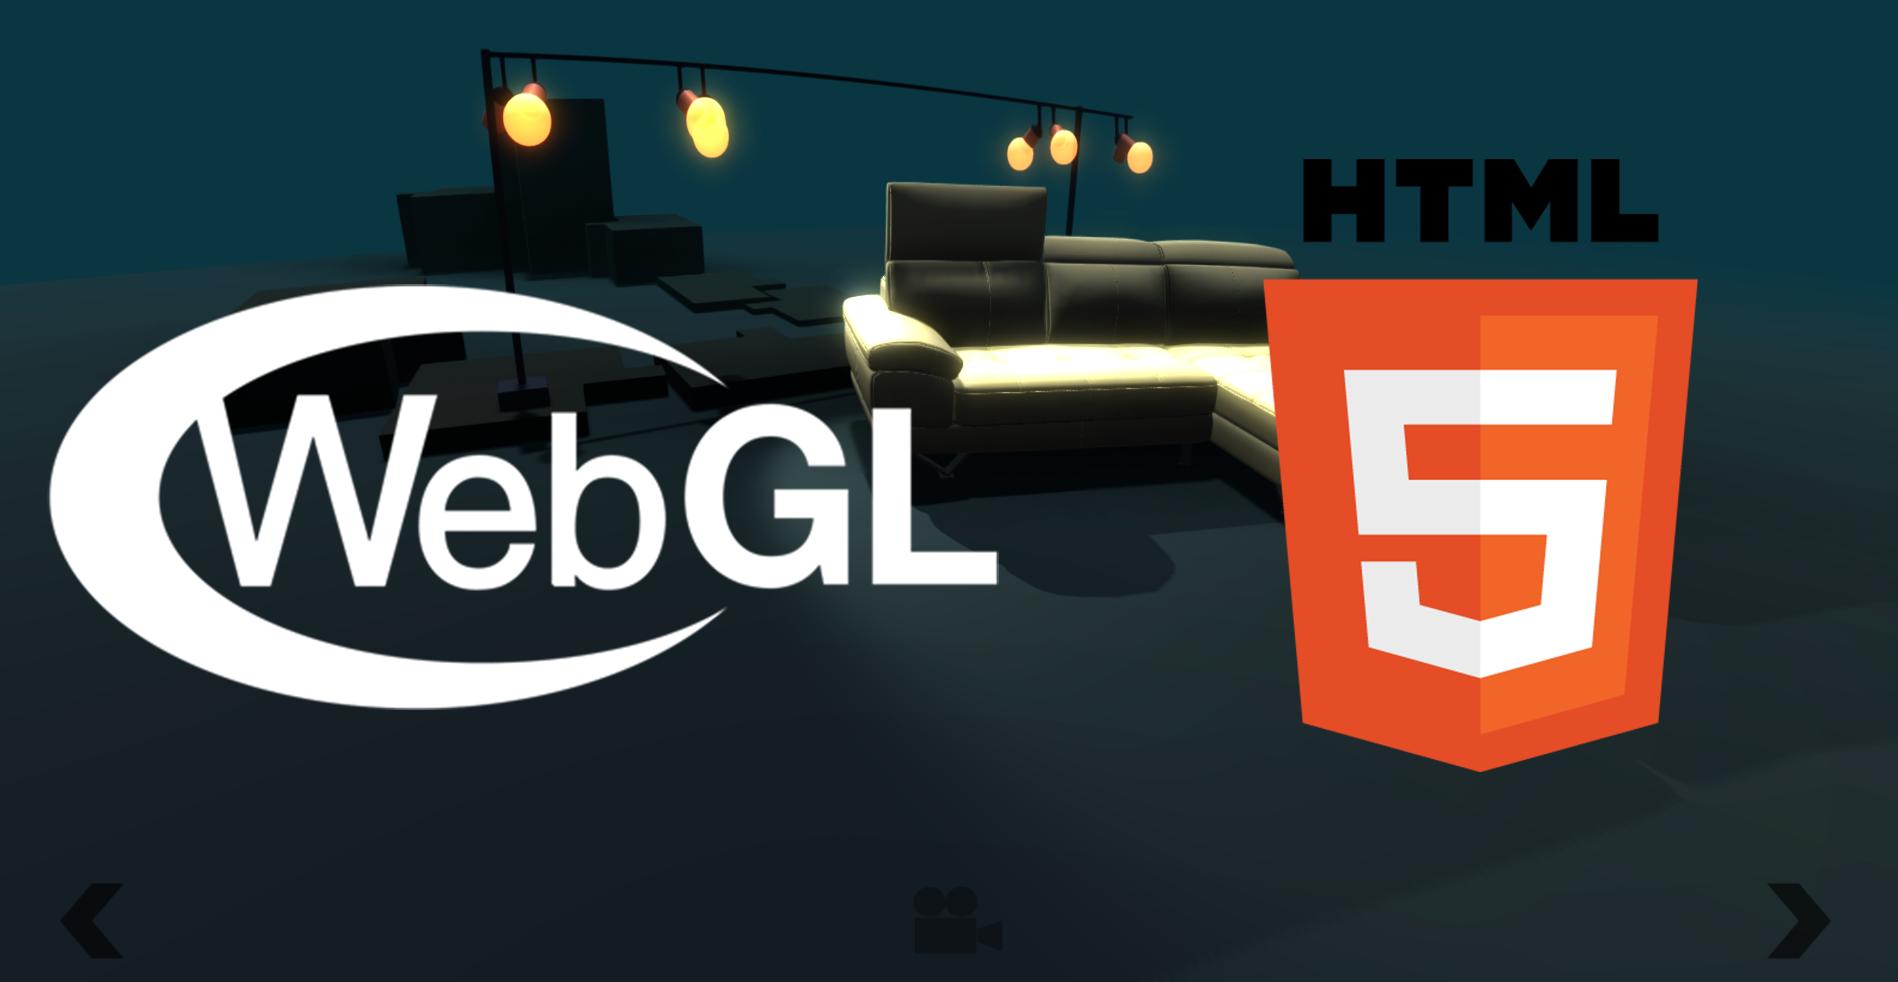 Sofas 3D Model Viewer (Unity, WebGL, HTML 5)